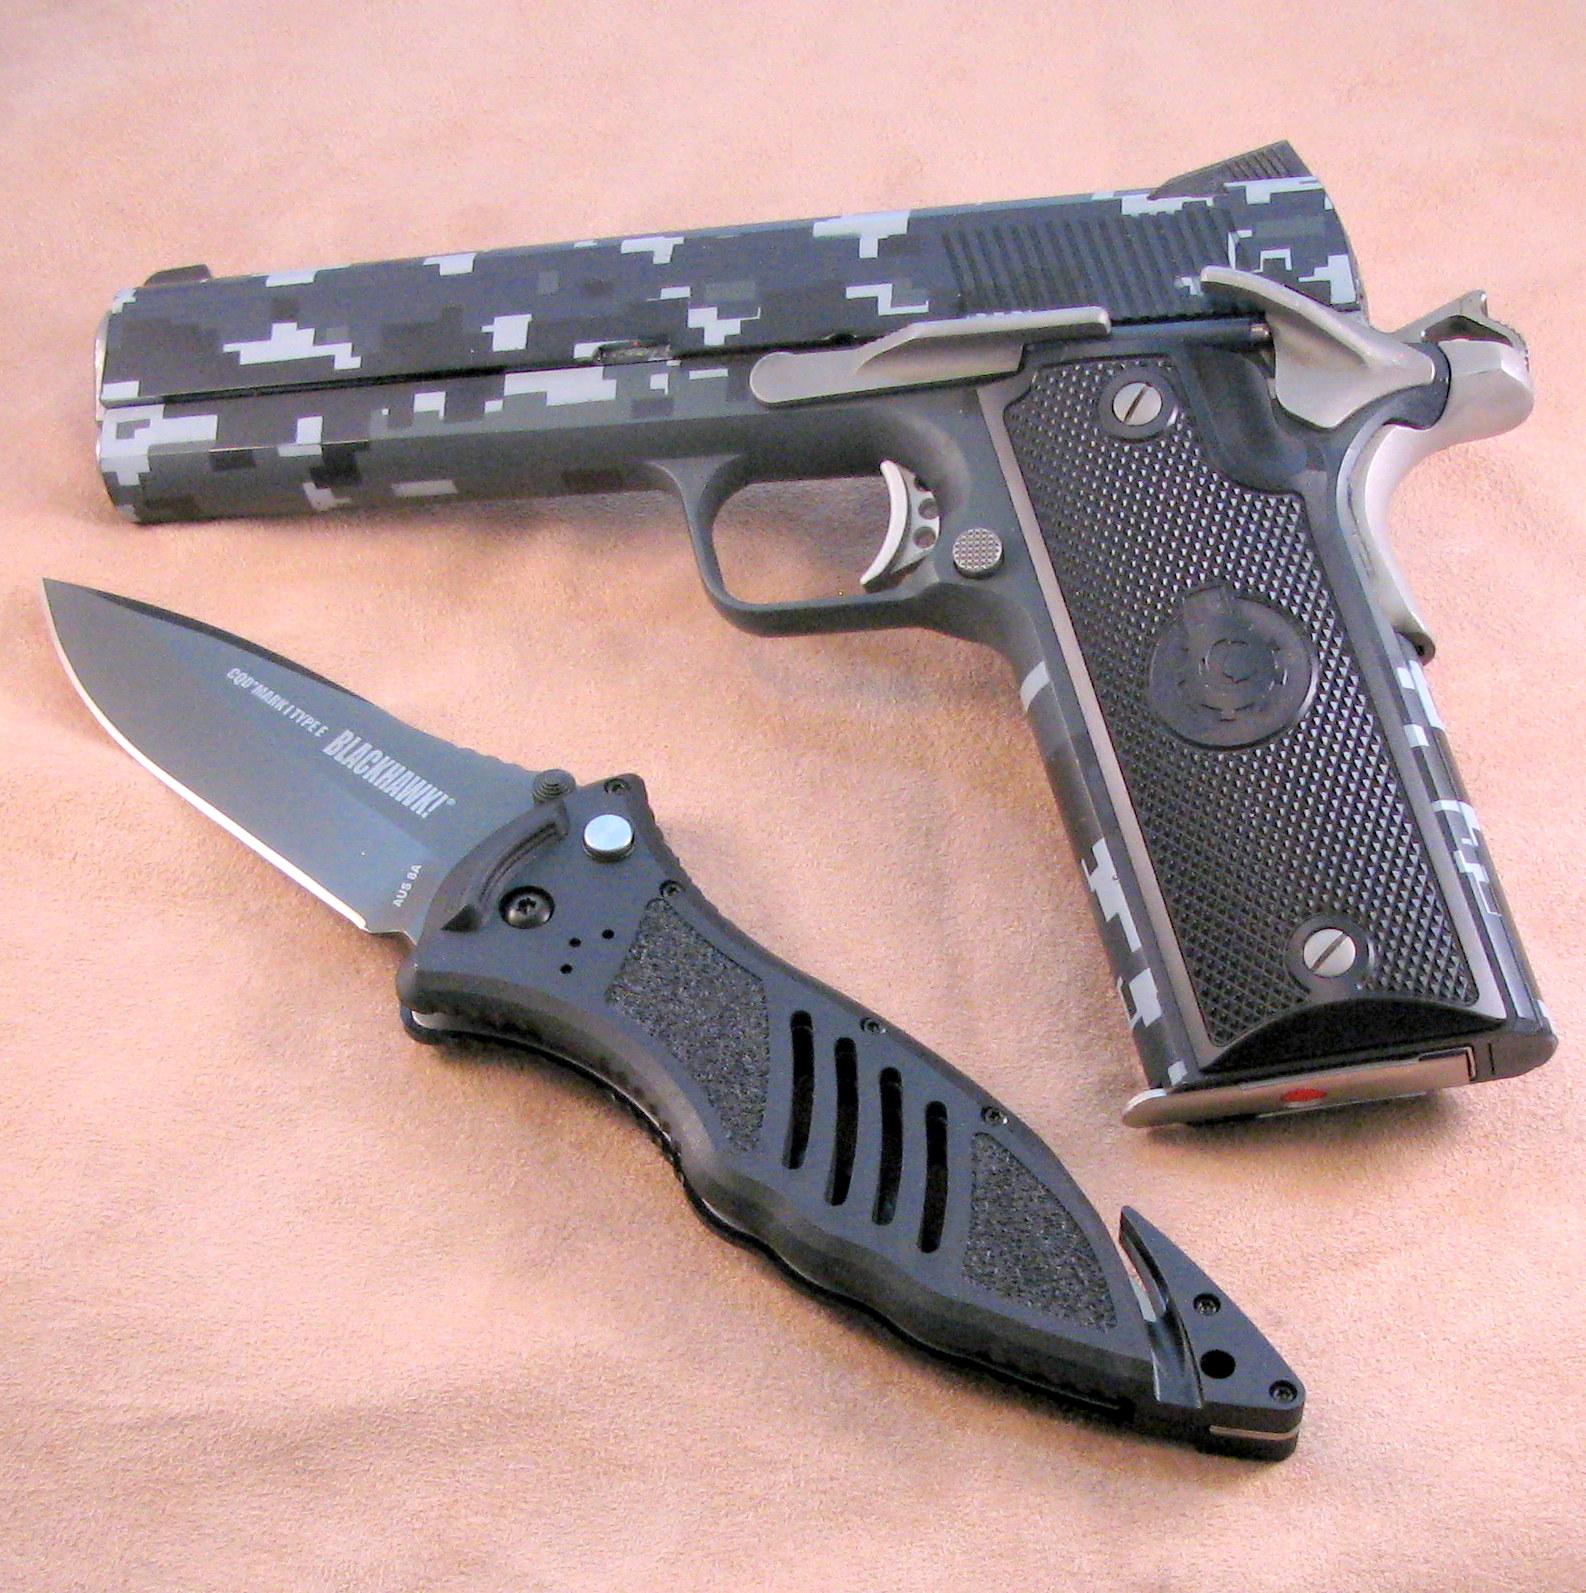 Master Blaster: Coonan Classic  357 Magnum Pistol | S W A T